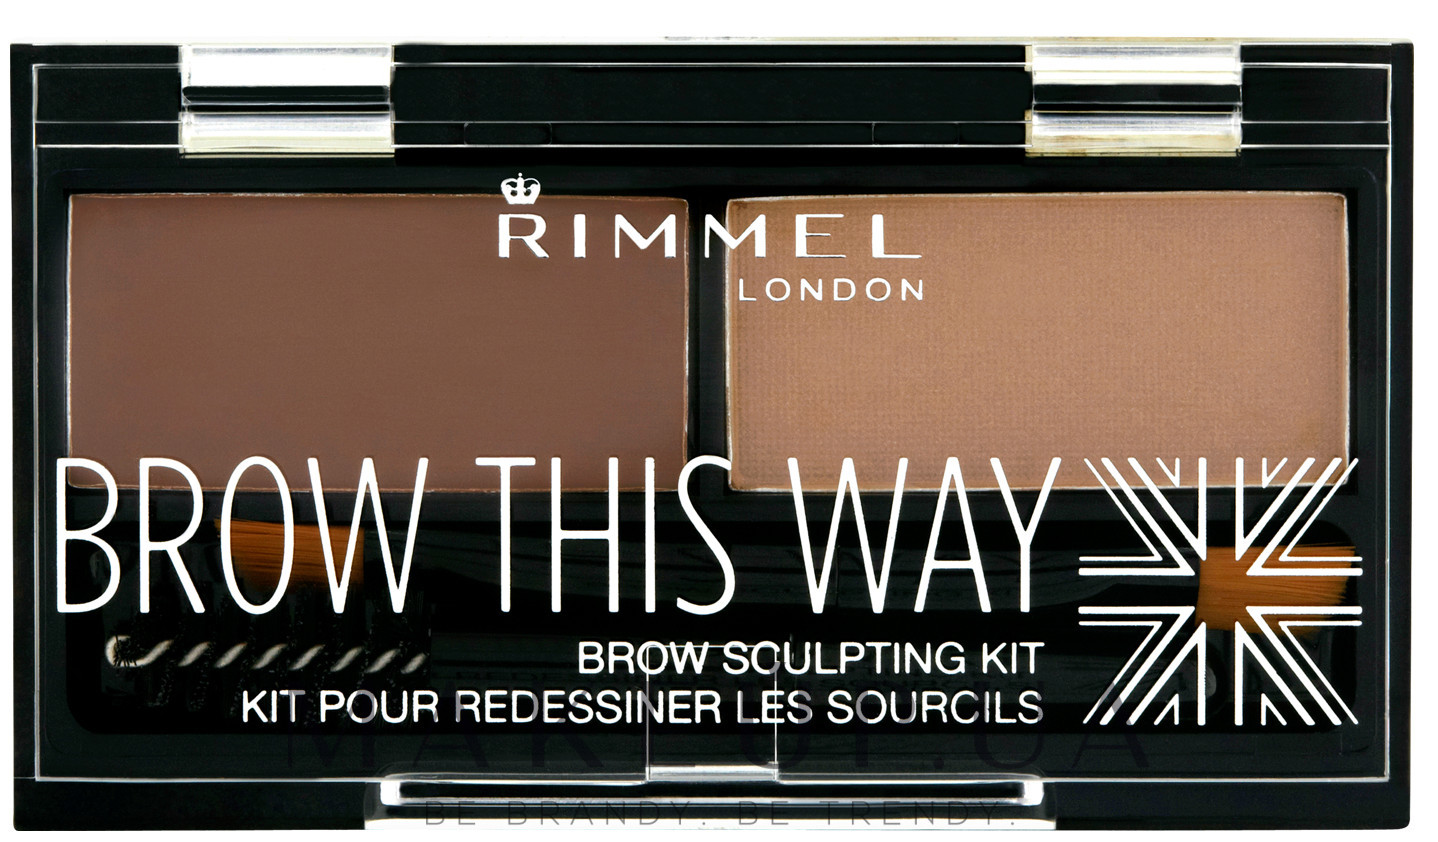 Brow This Way Eyebrow Sculpting Kit от Rimmel